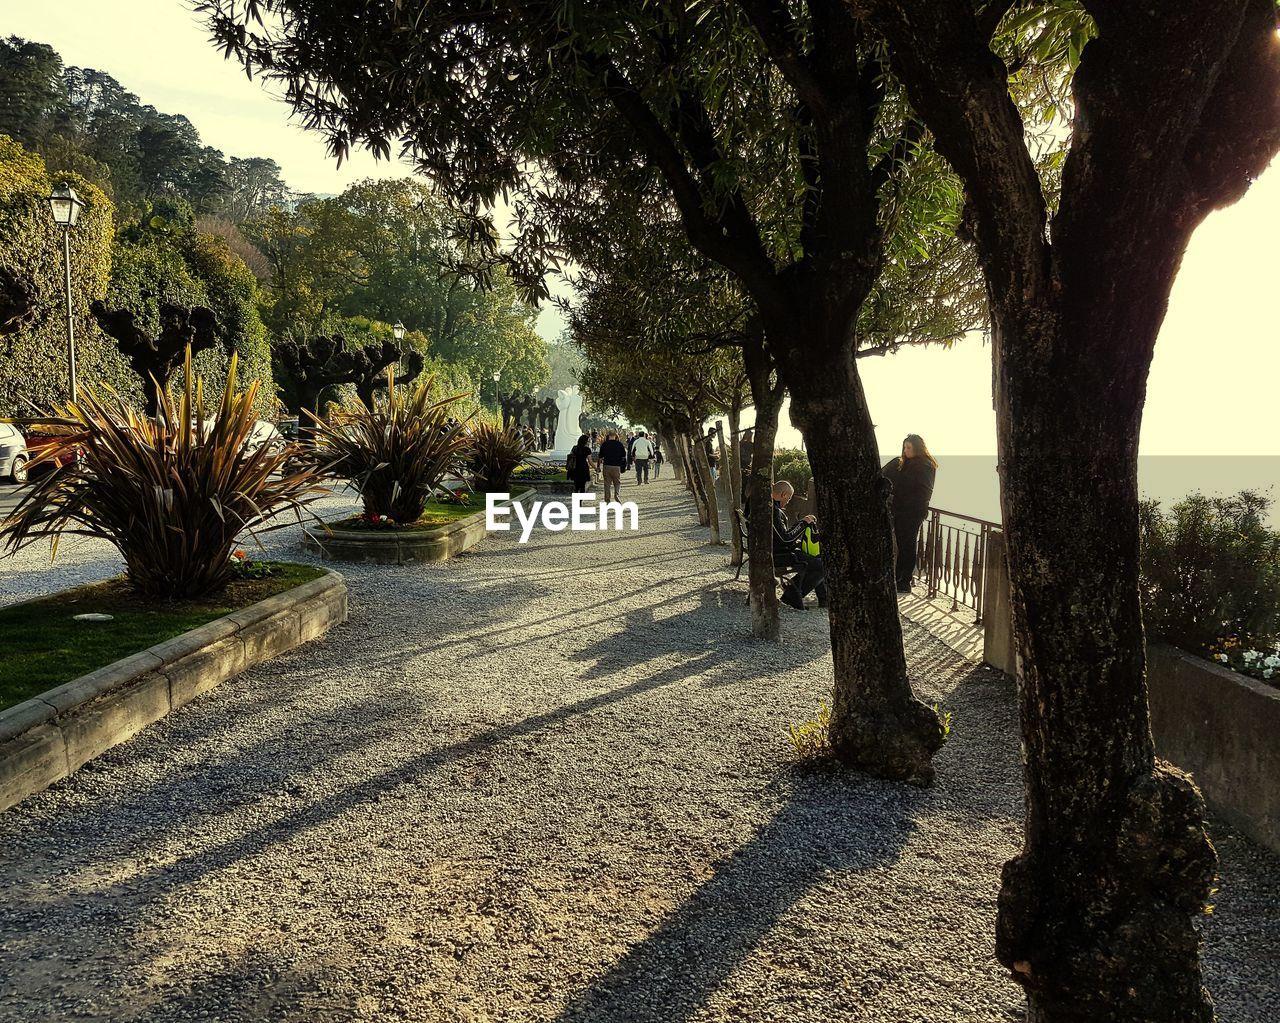 Treelined On Walkway During Sunny Day